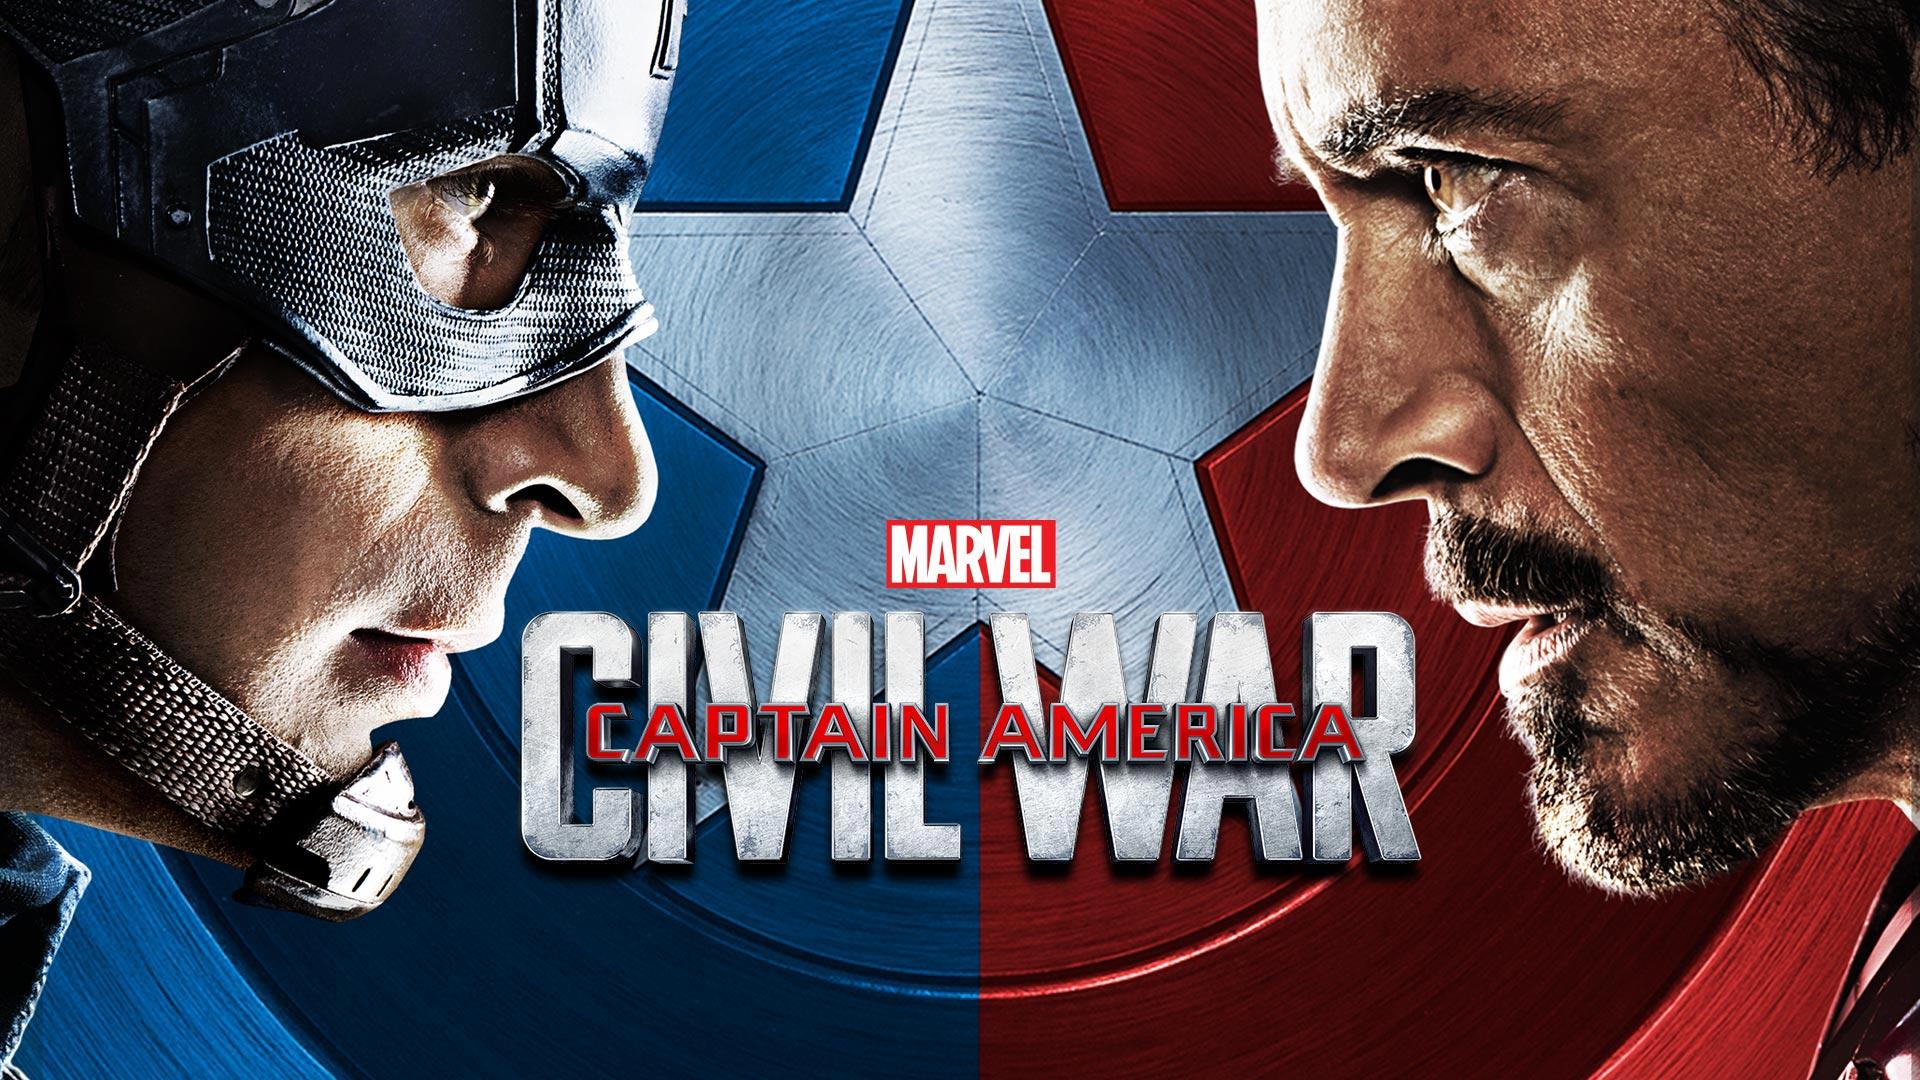 Marvel Studios' Captain America: Civil War (4K UHD)